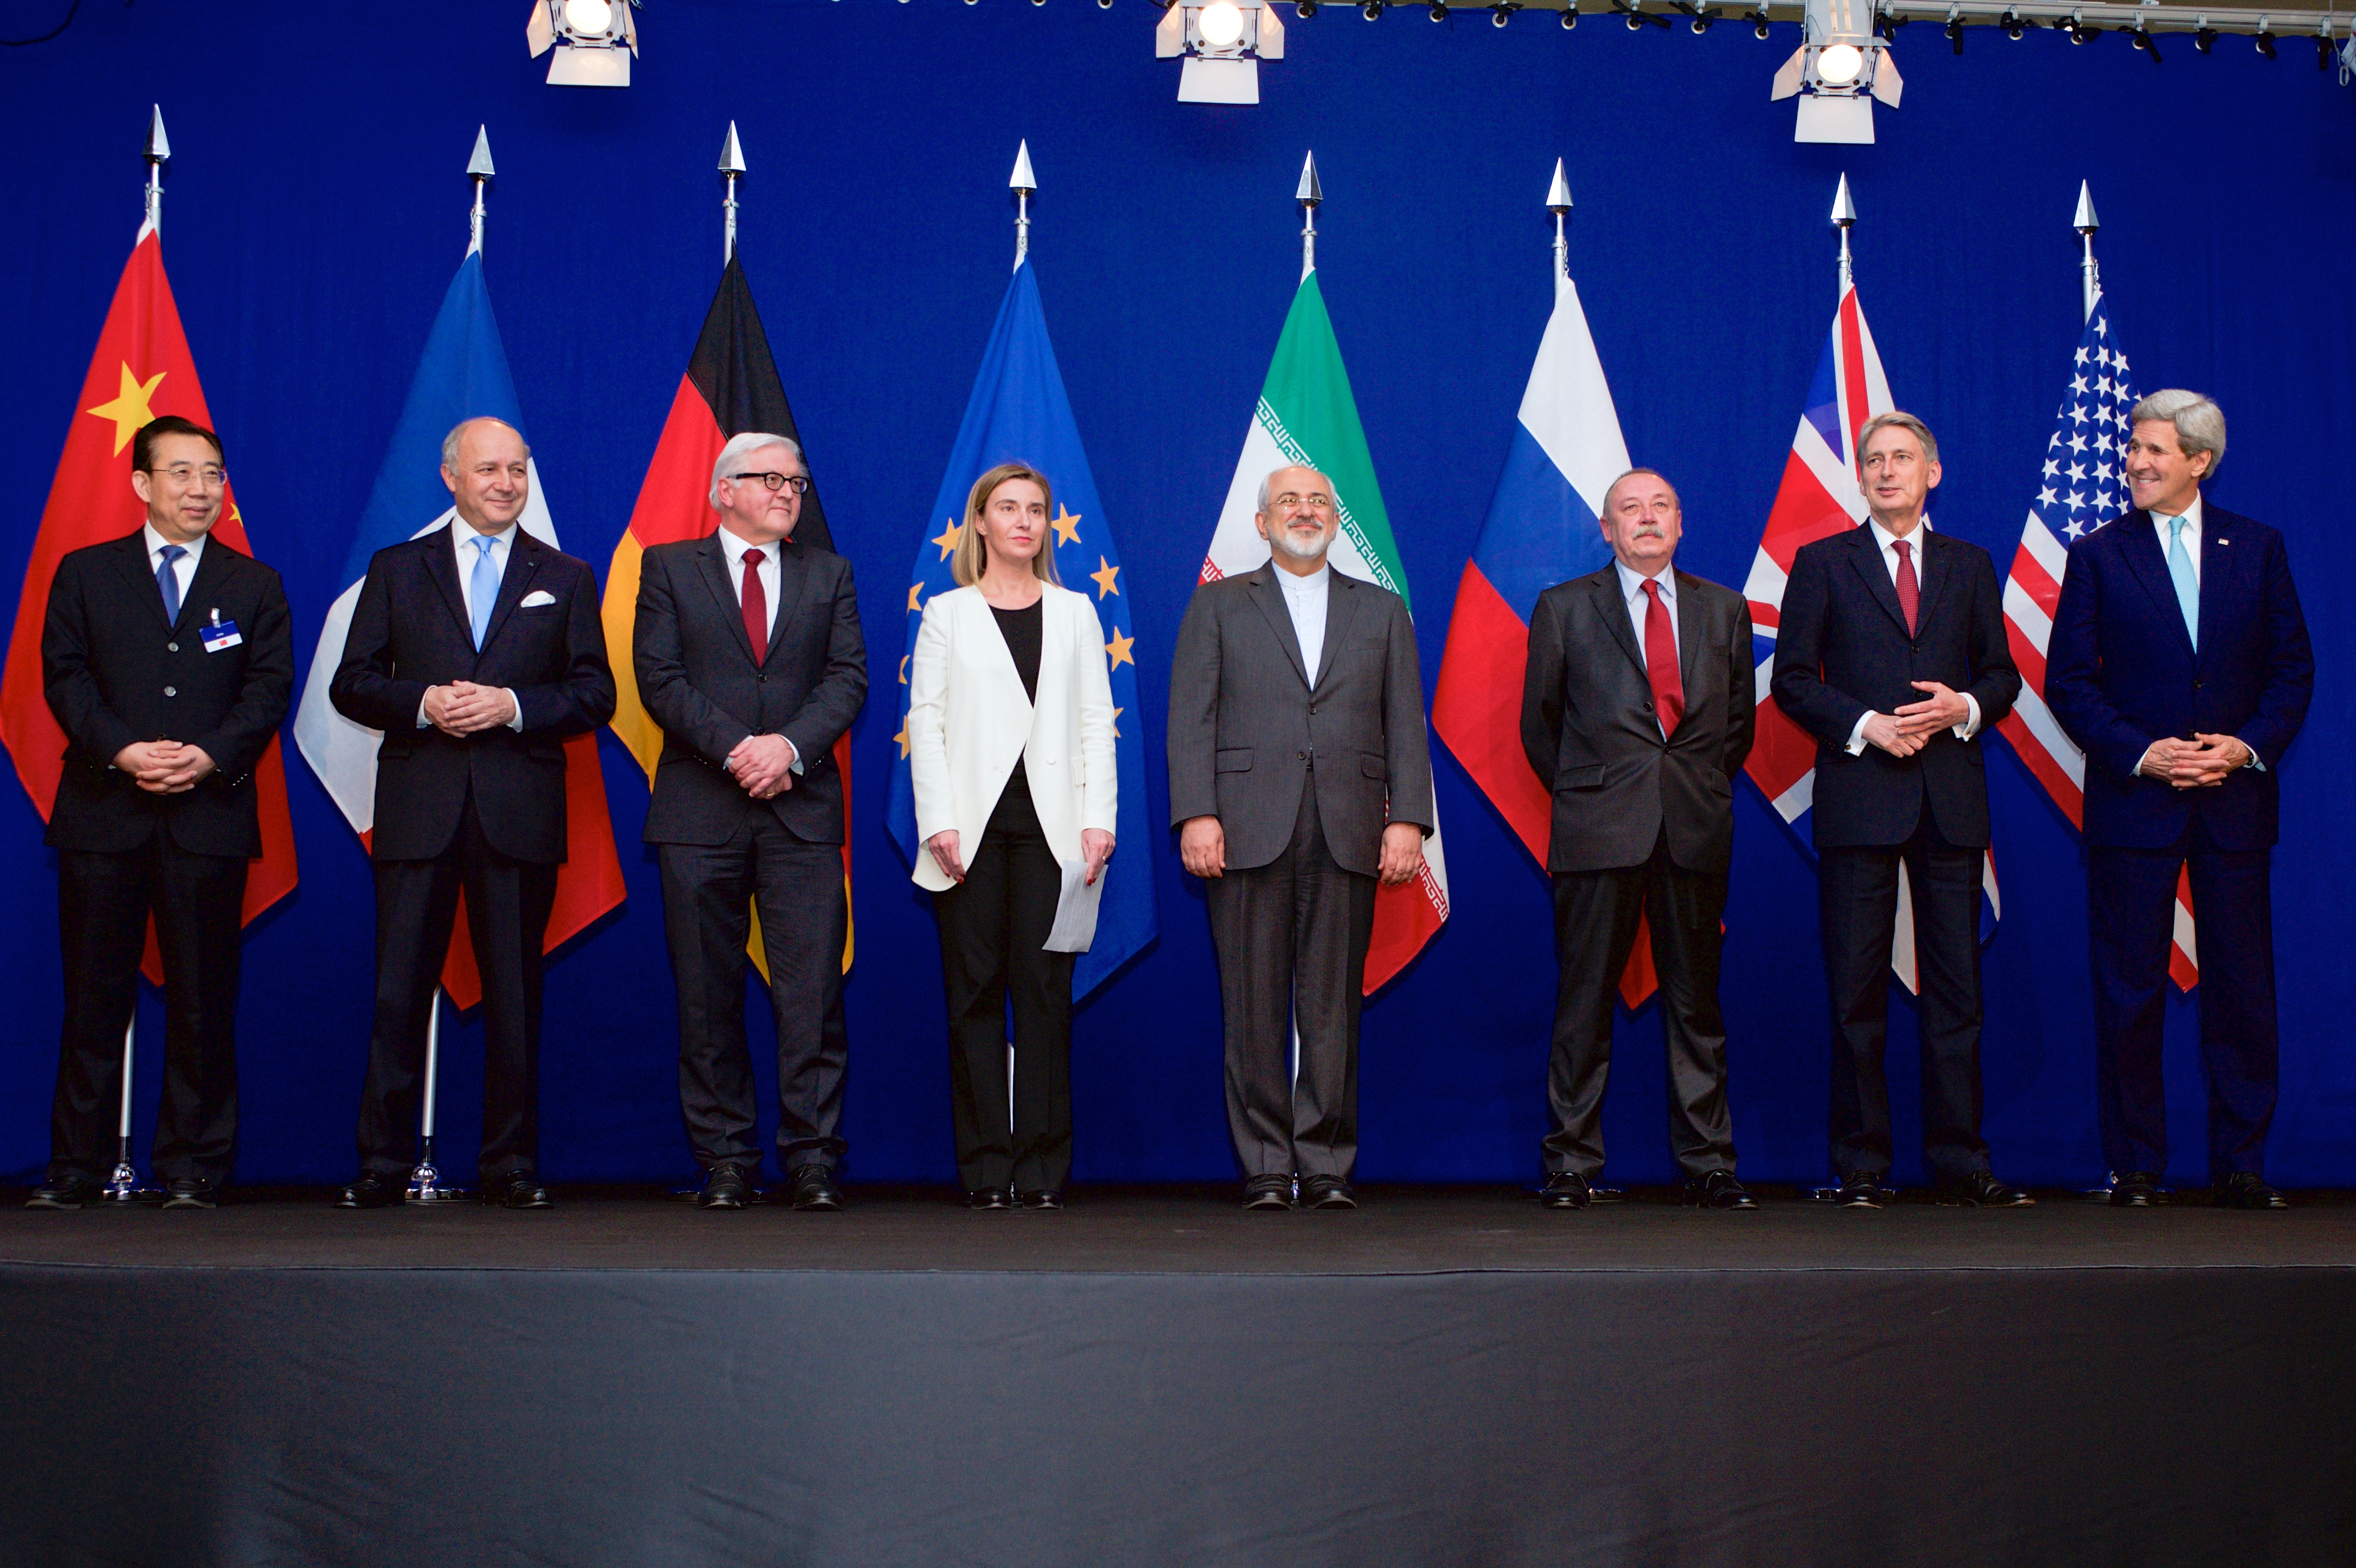 Iran nuclear deal jcpoa